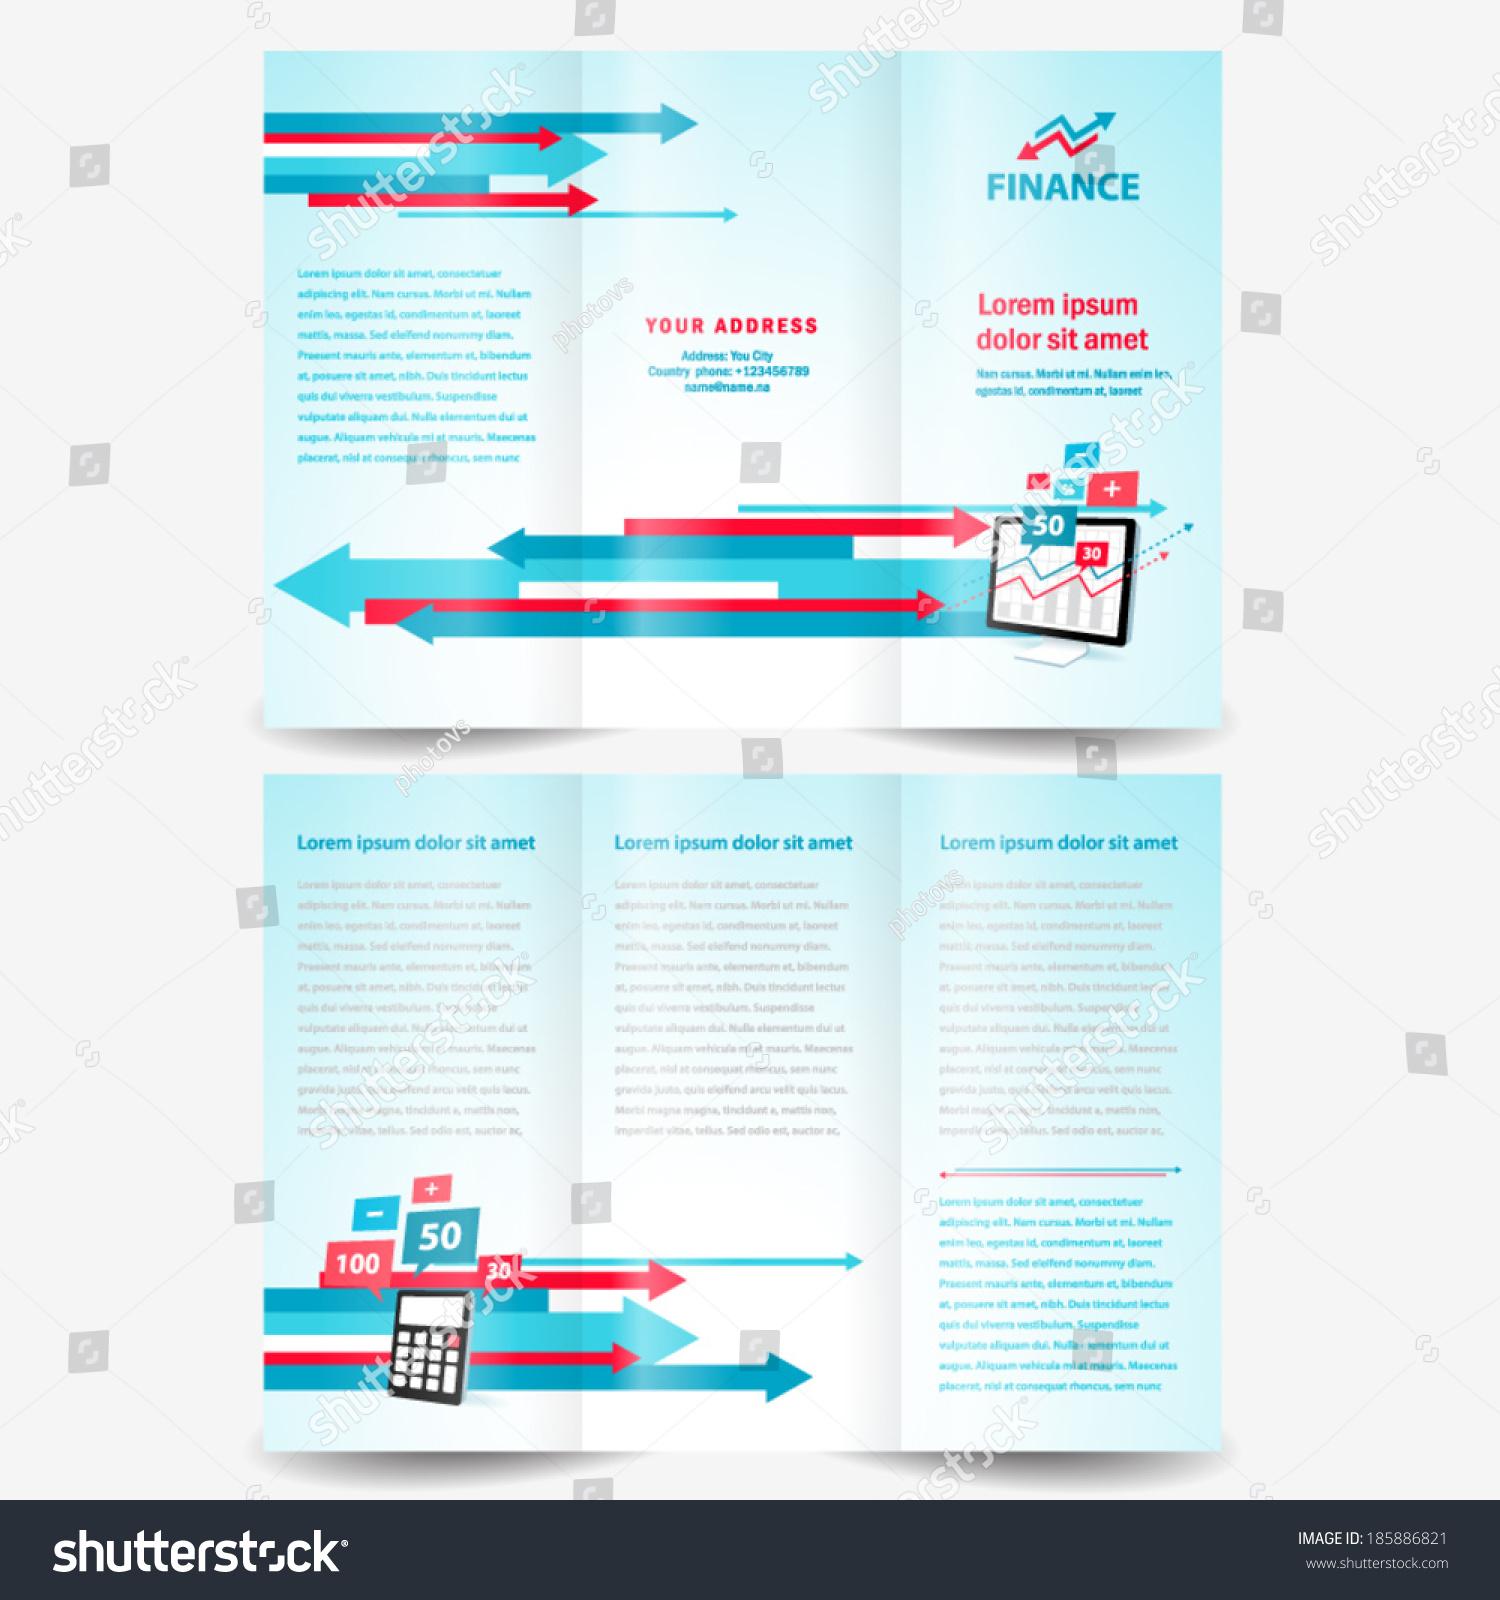 brochure design template finance arrow element stock vector royalty